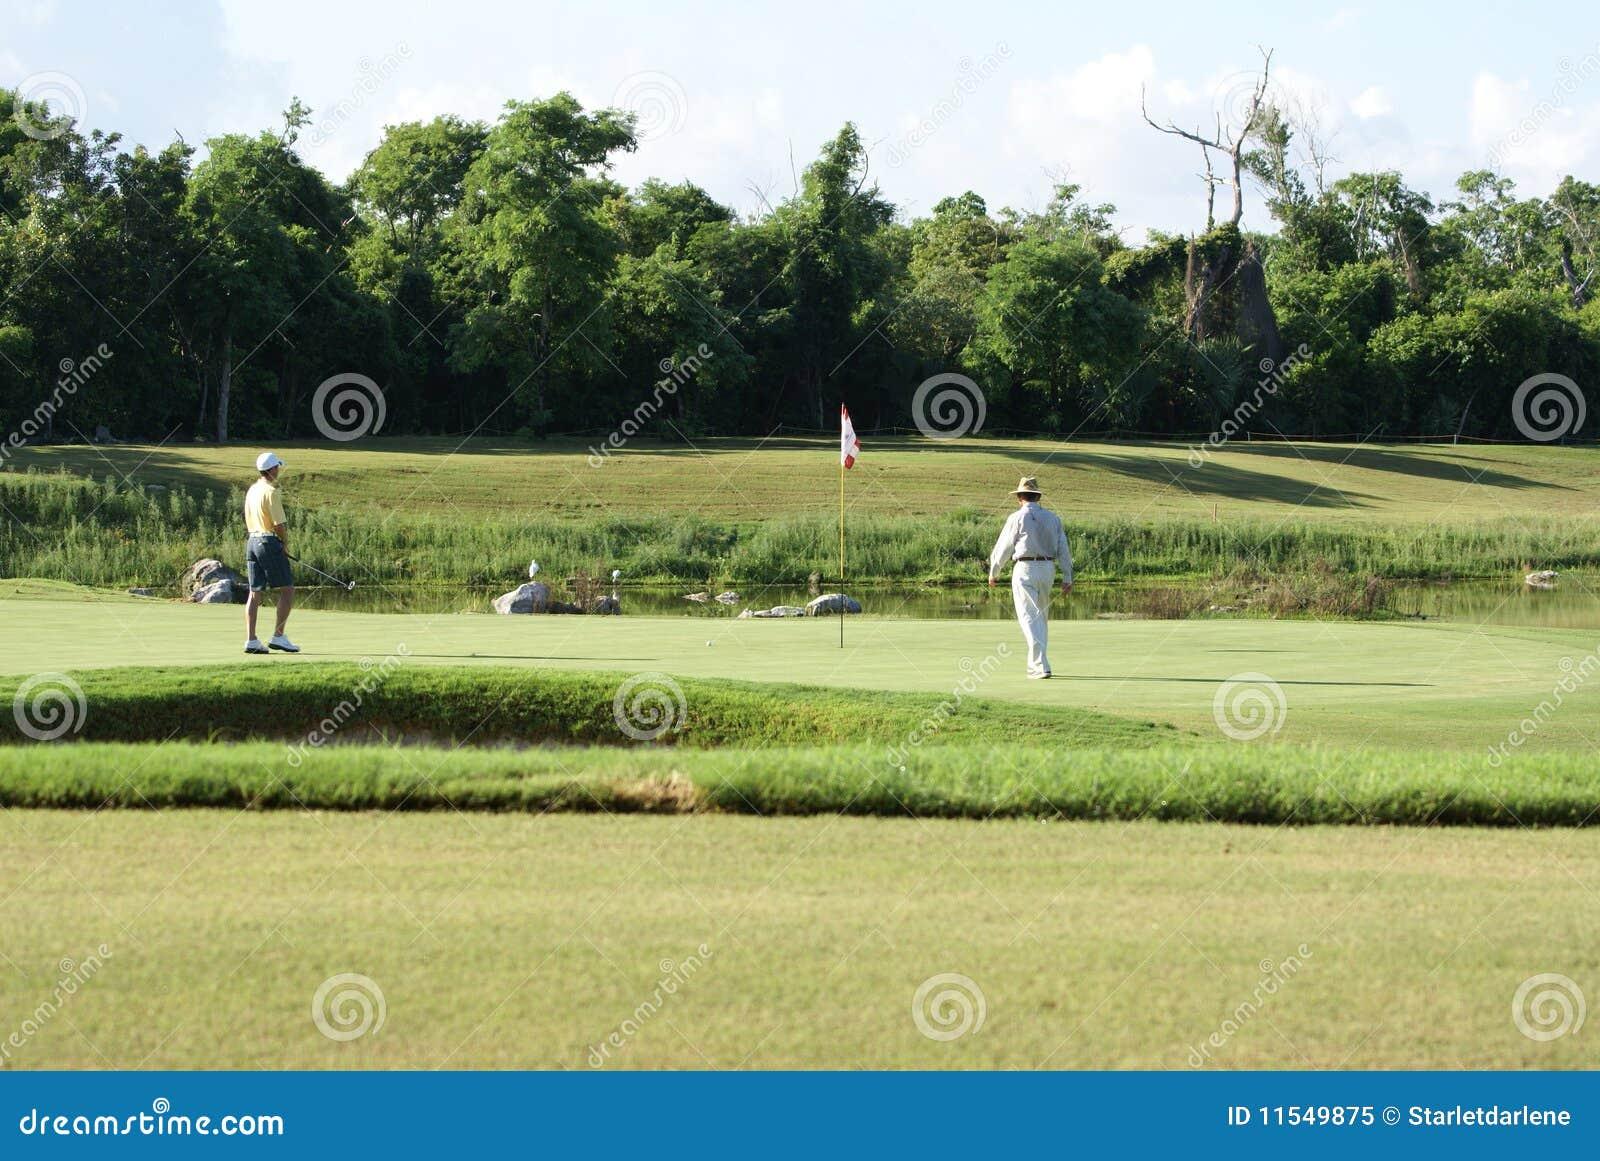 Man Golfing with Caddy